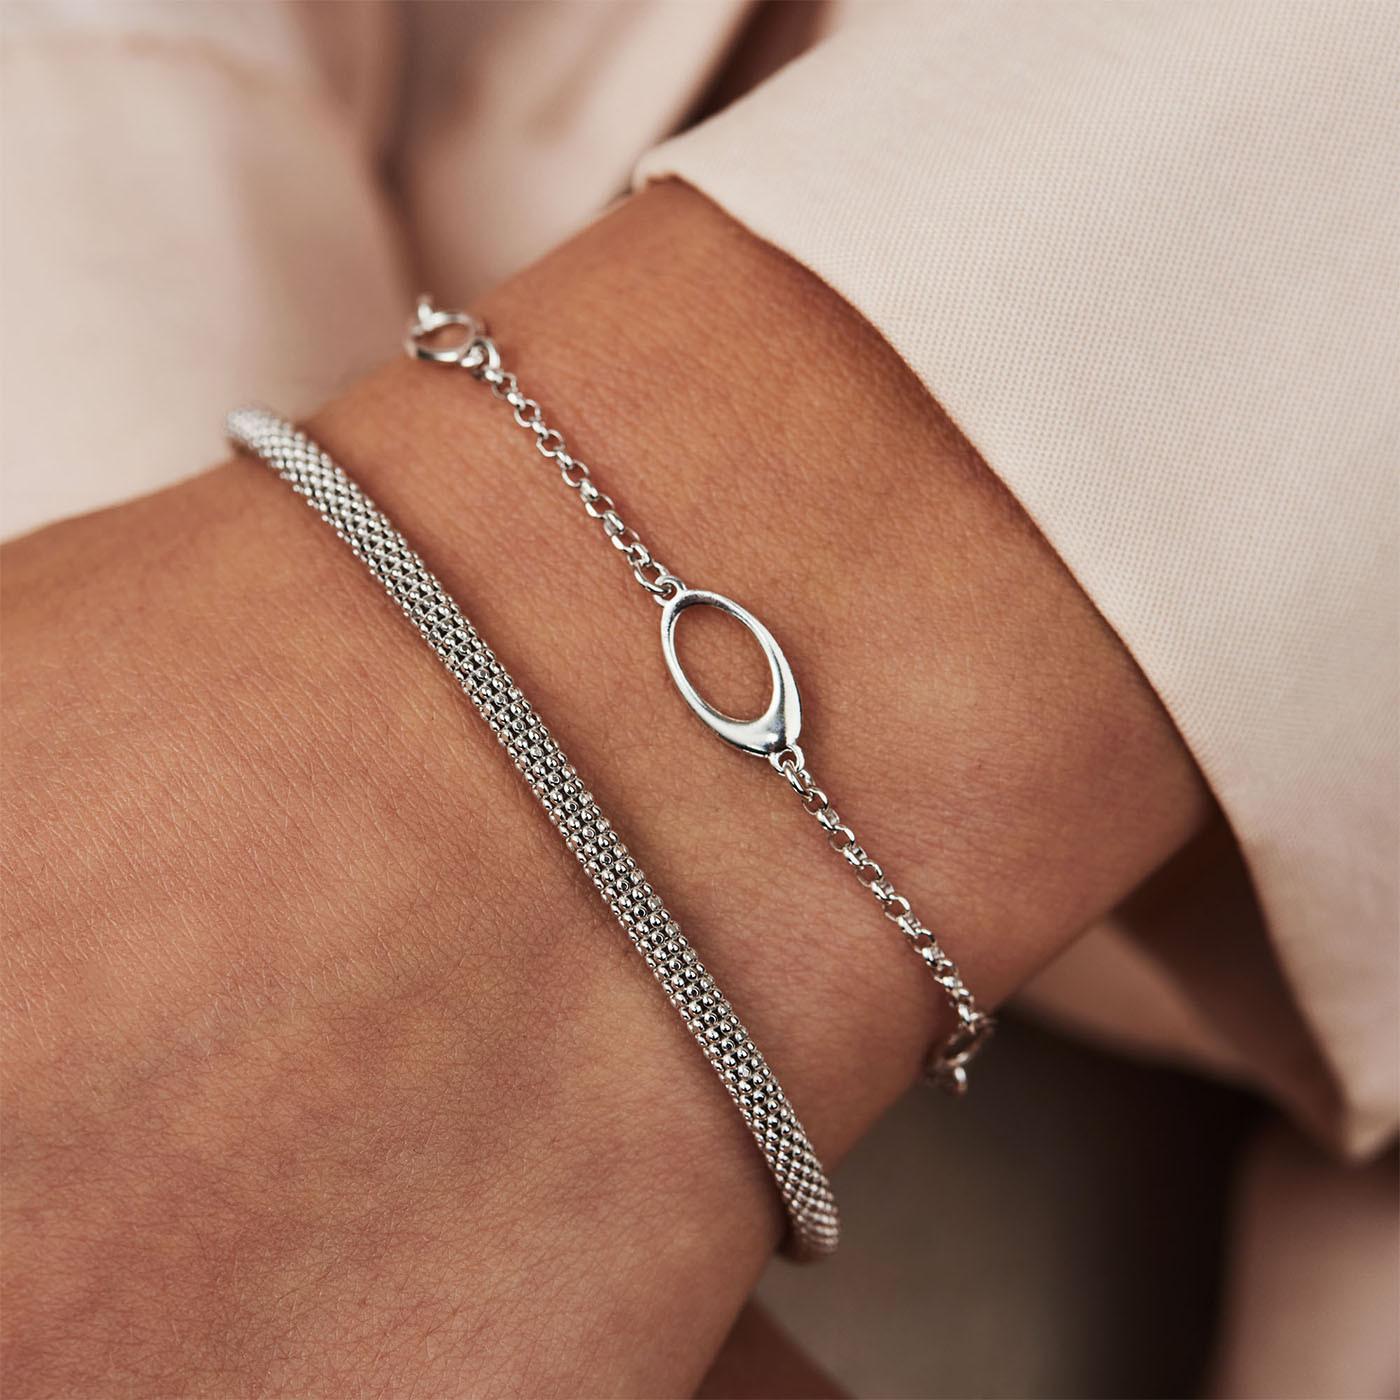 Selected Jewels Emma Vieve 925 sterling zilveren armband